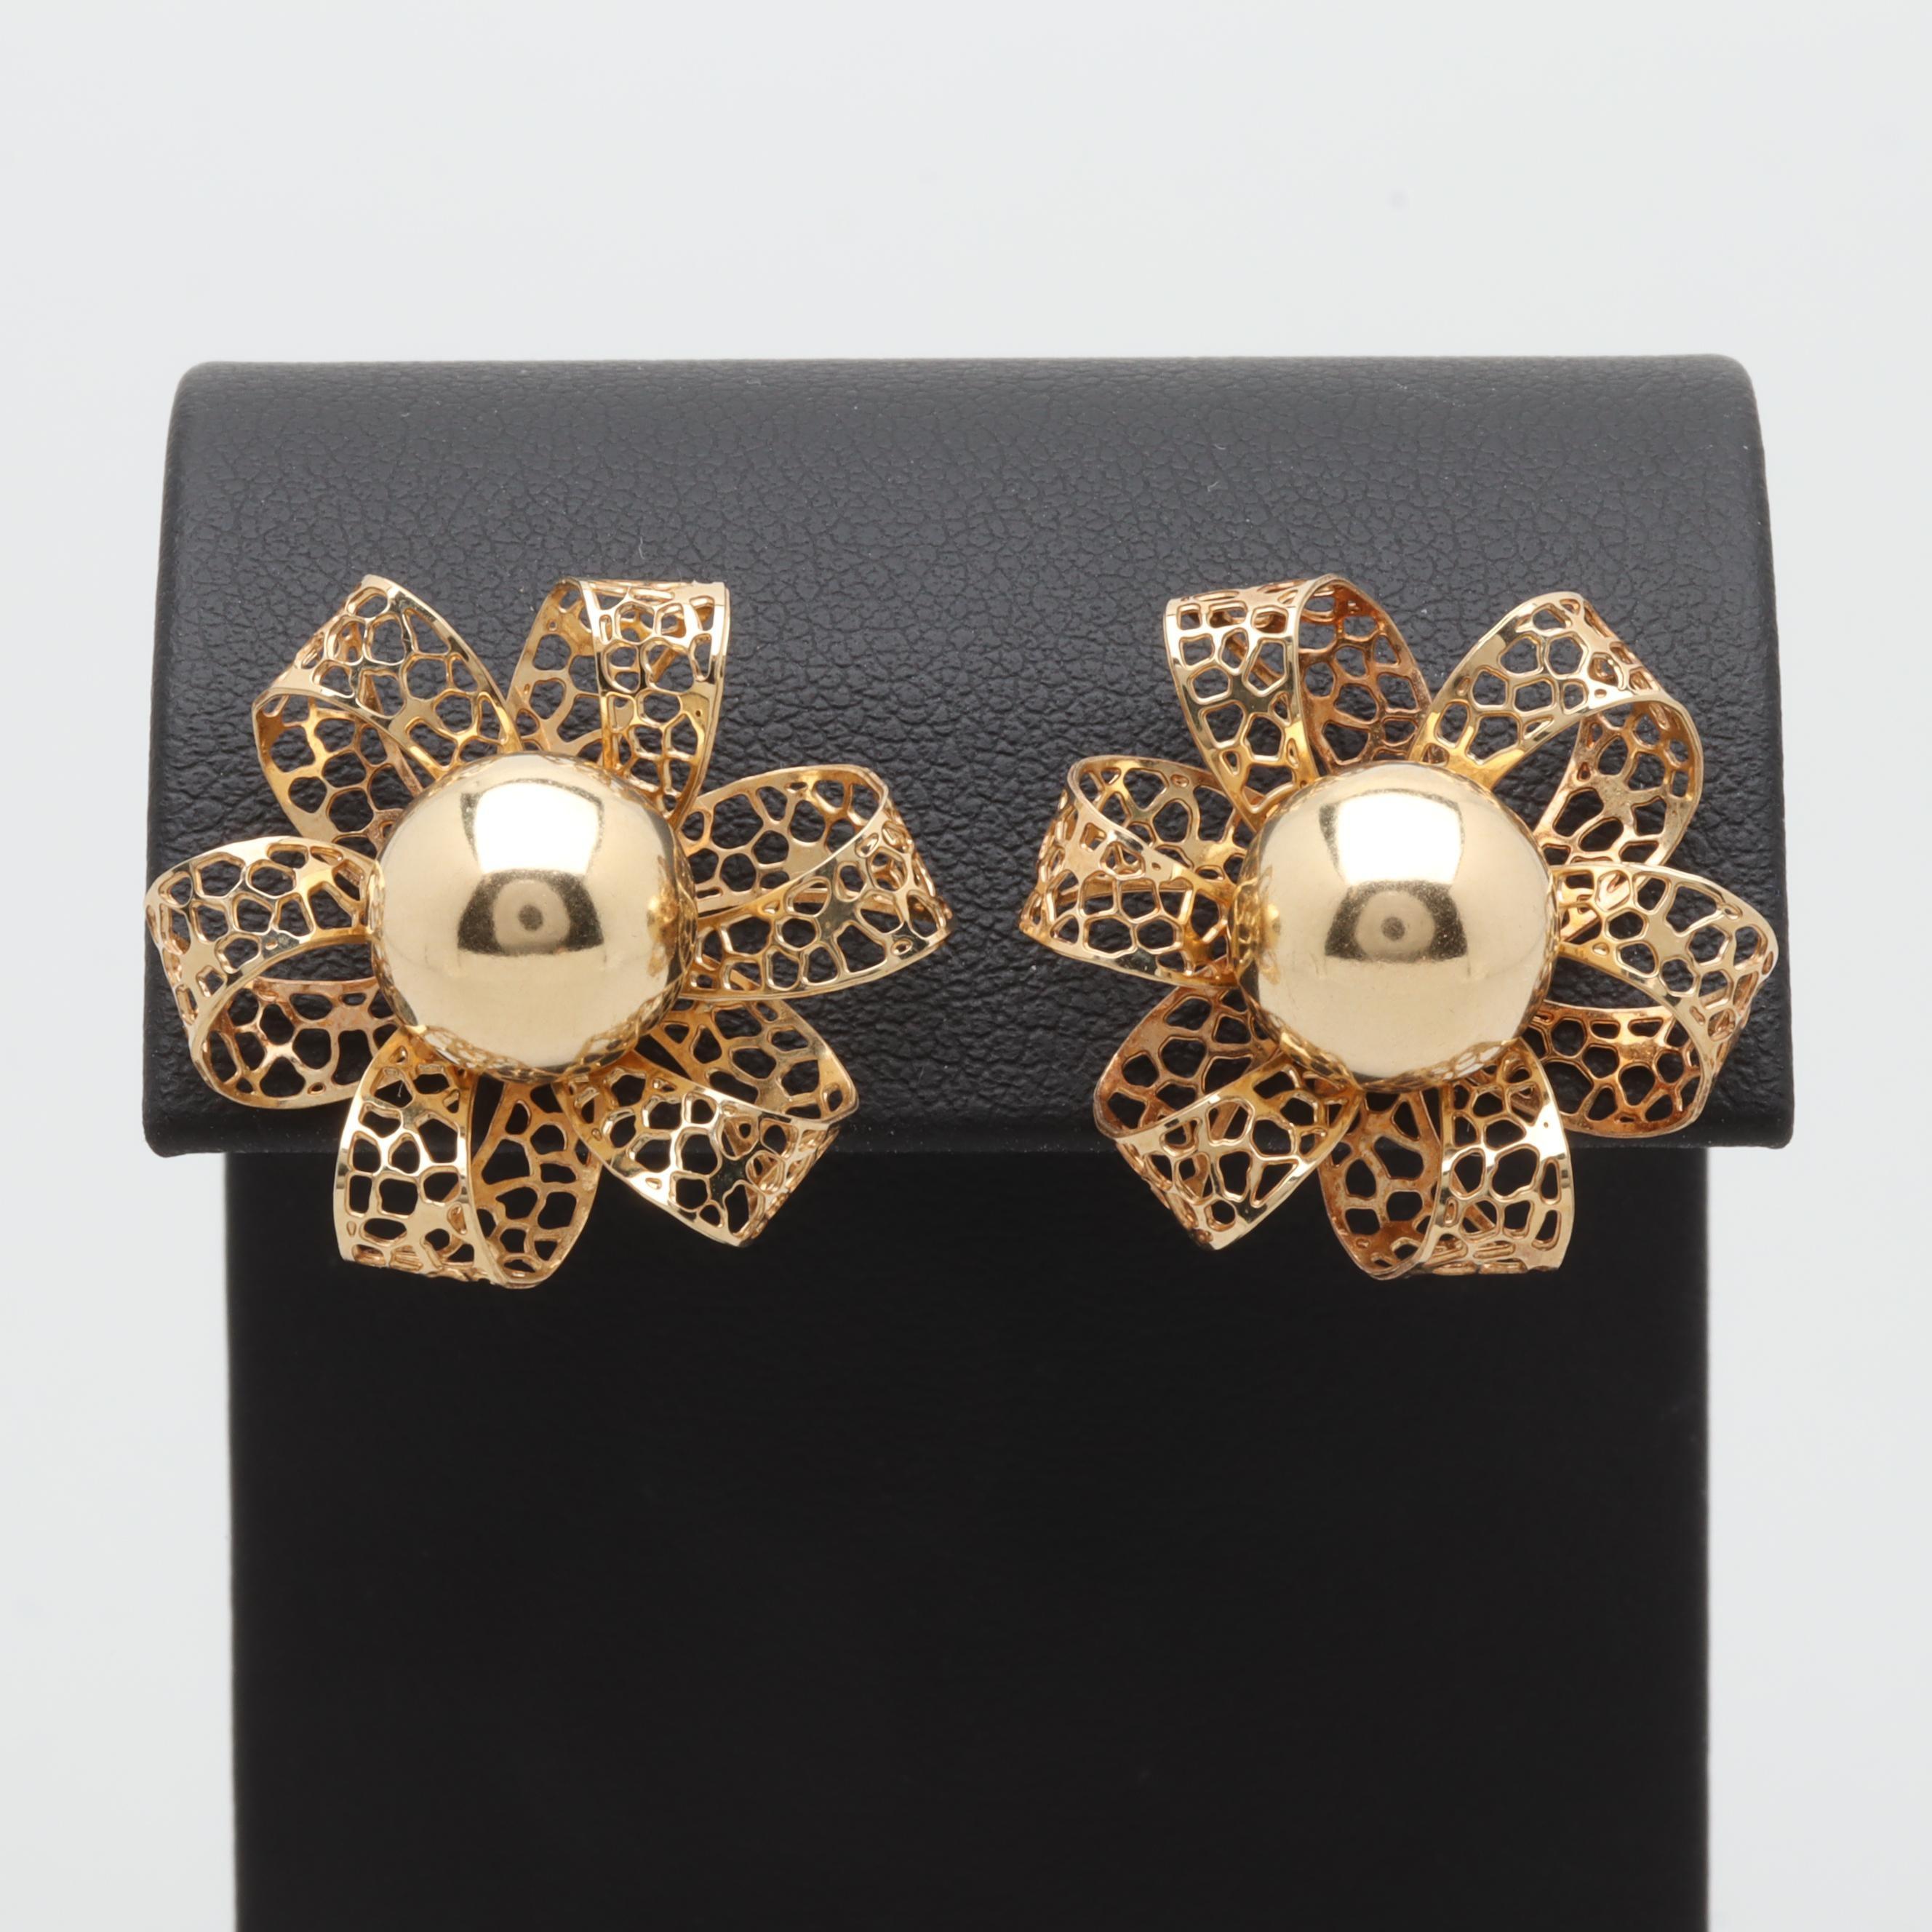 14K Yellow Gold Stud Earrings With Flower Motif Jackets